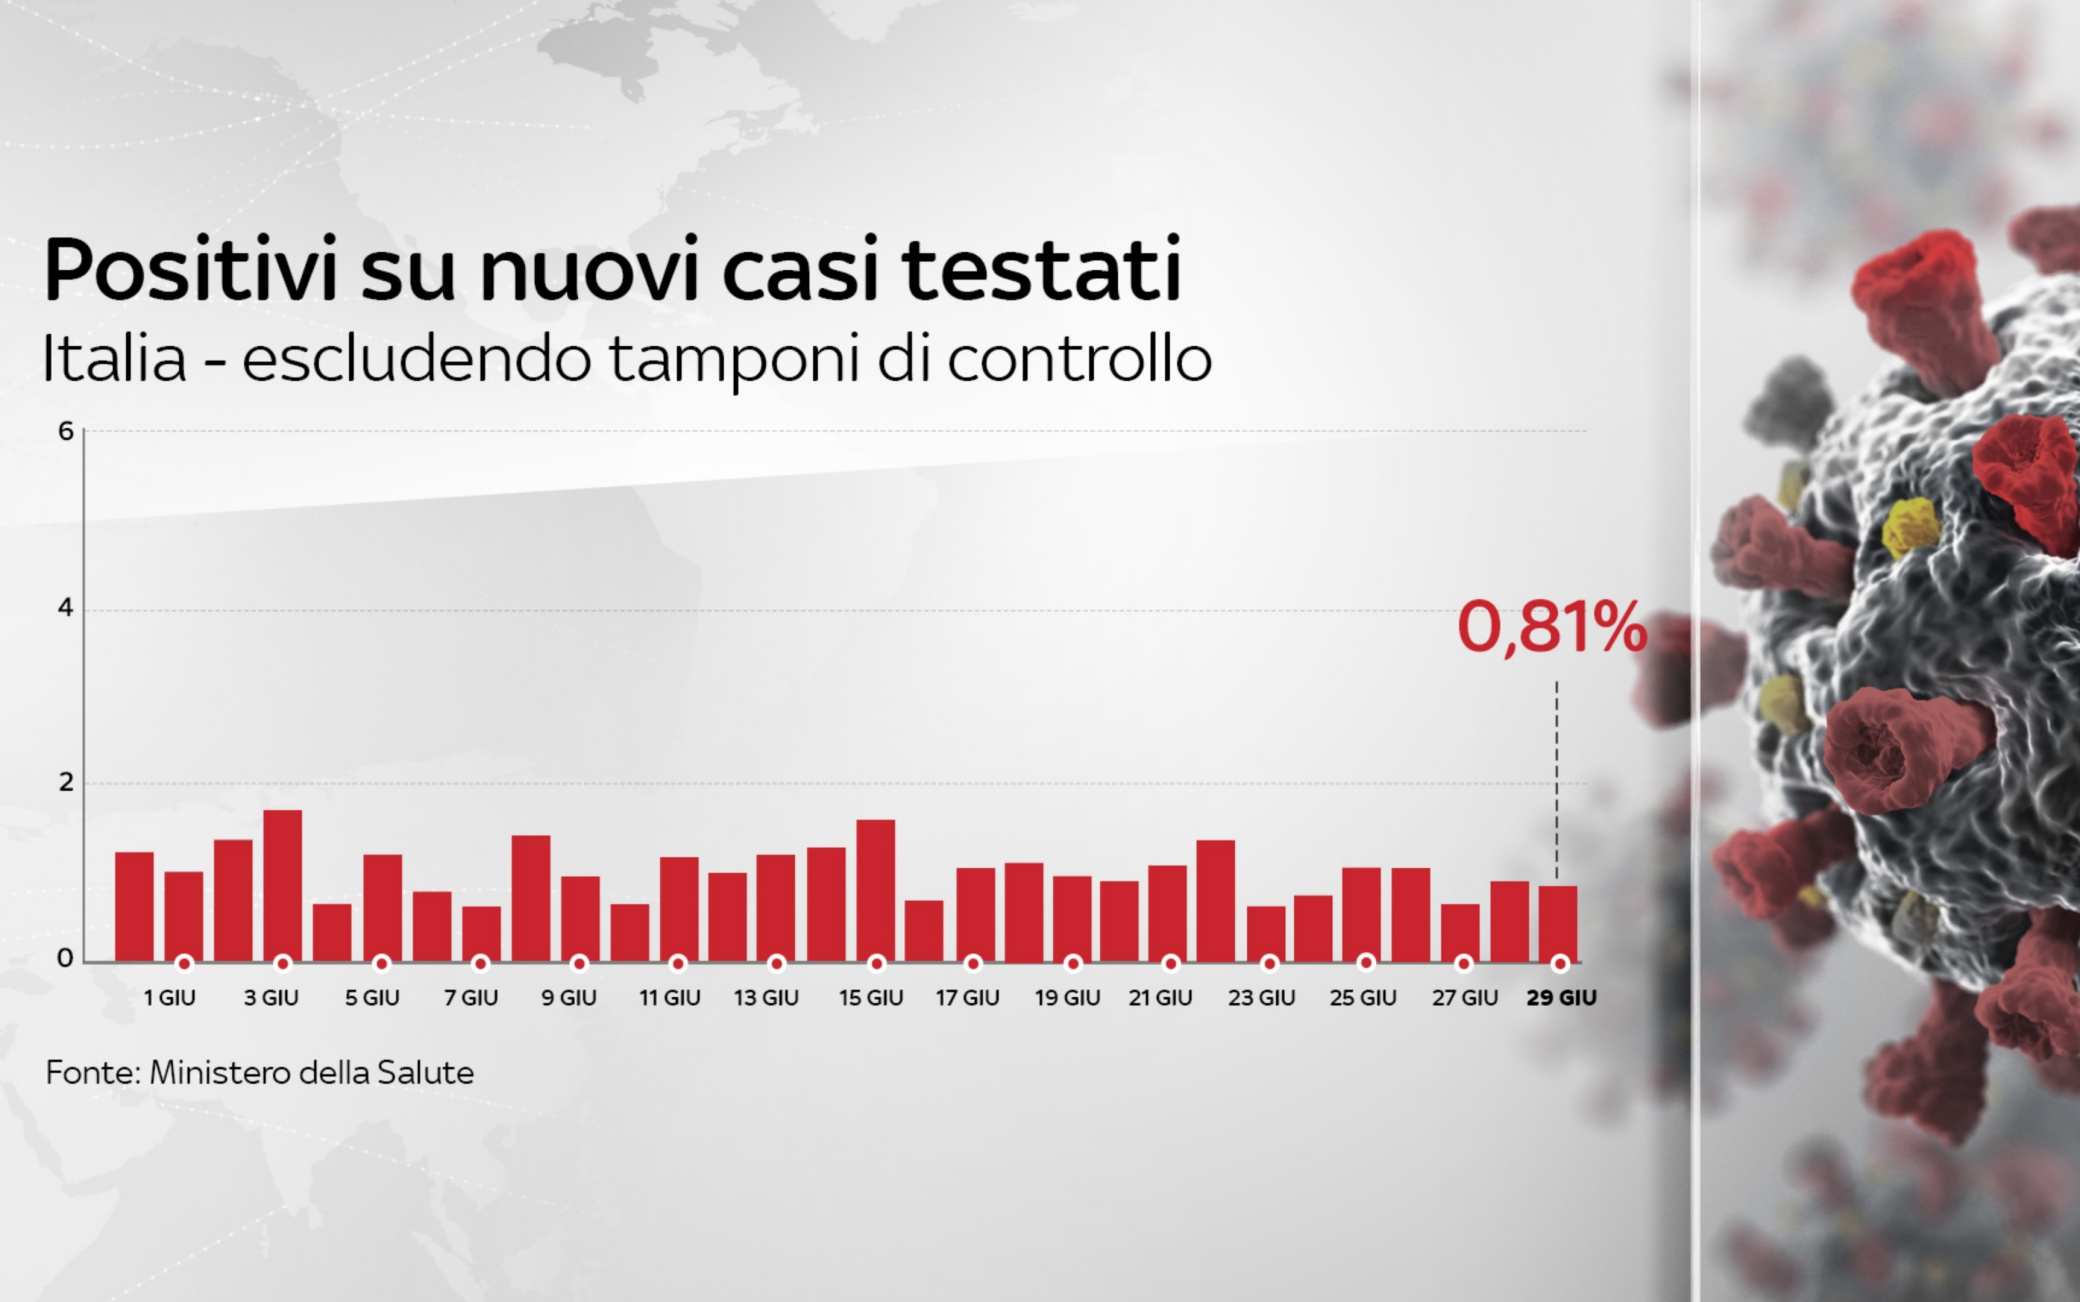 positivi su nuovi casi testati coronavirus italia